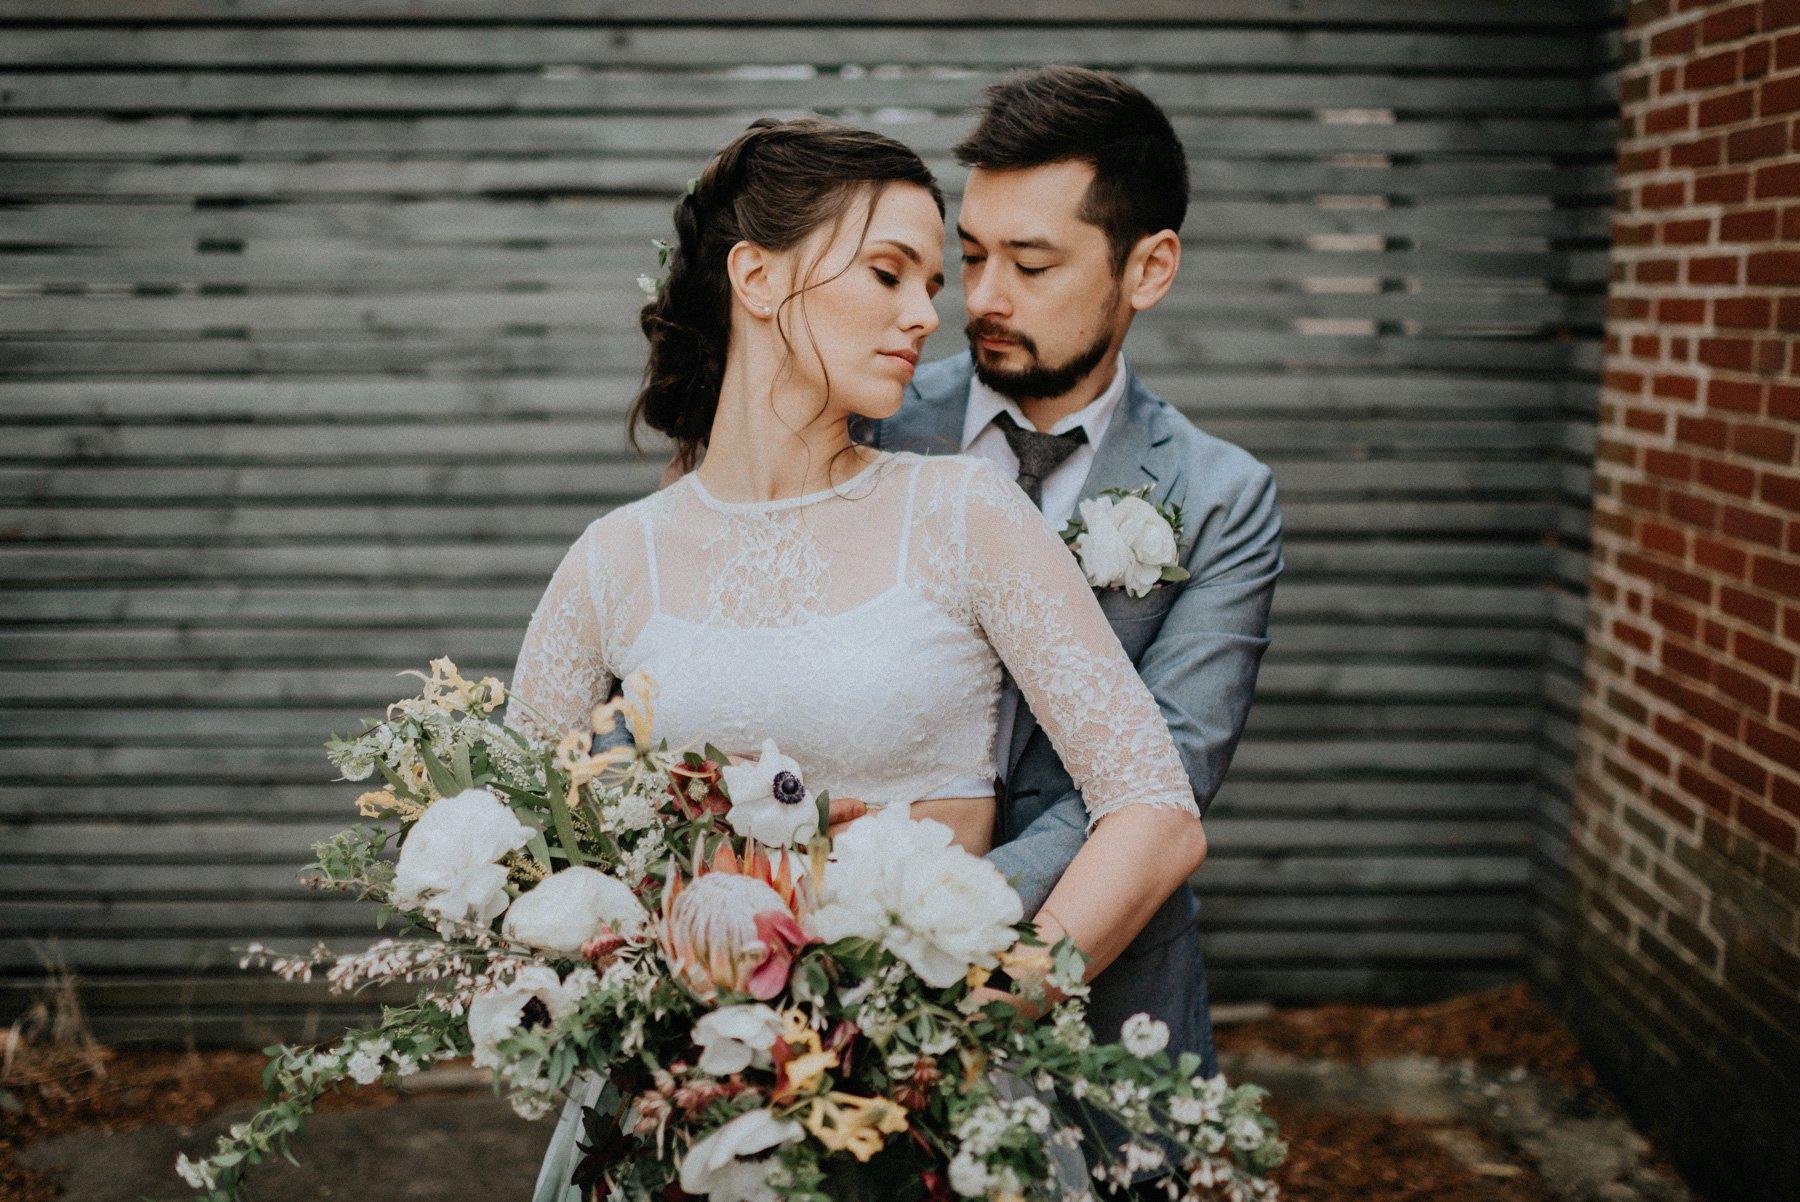 greenhouse-botanical-wedding-55.jpg